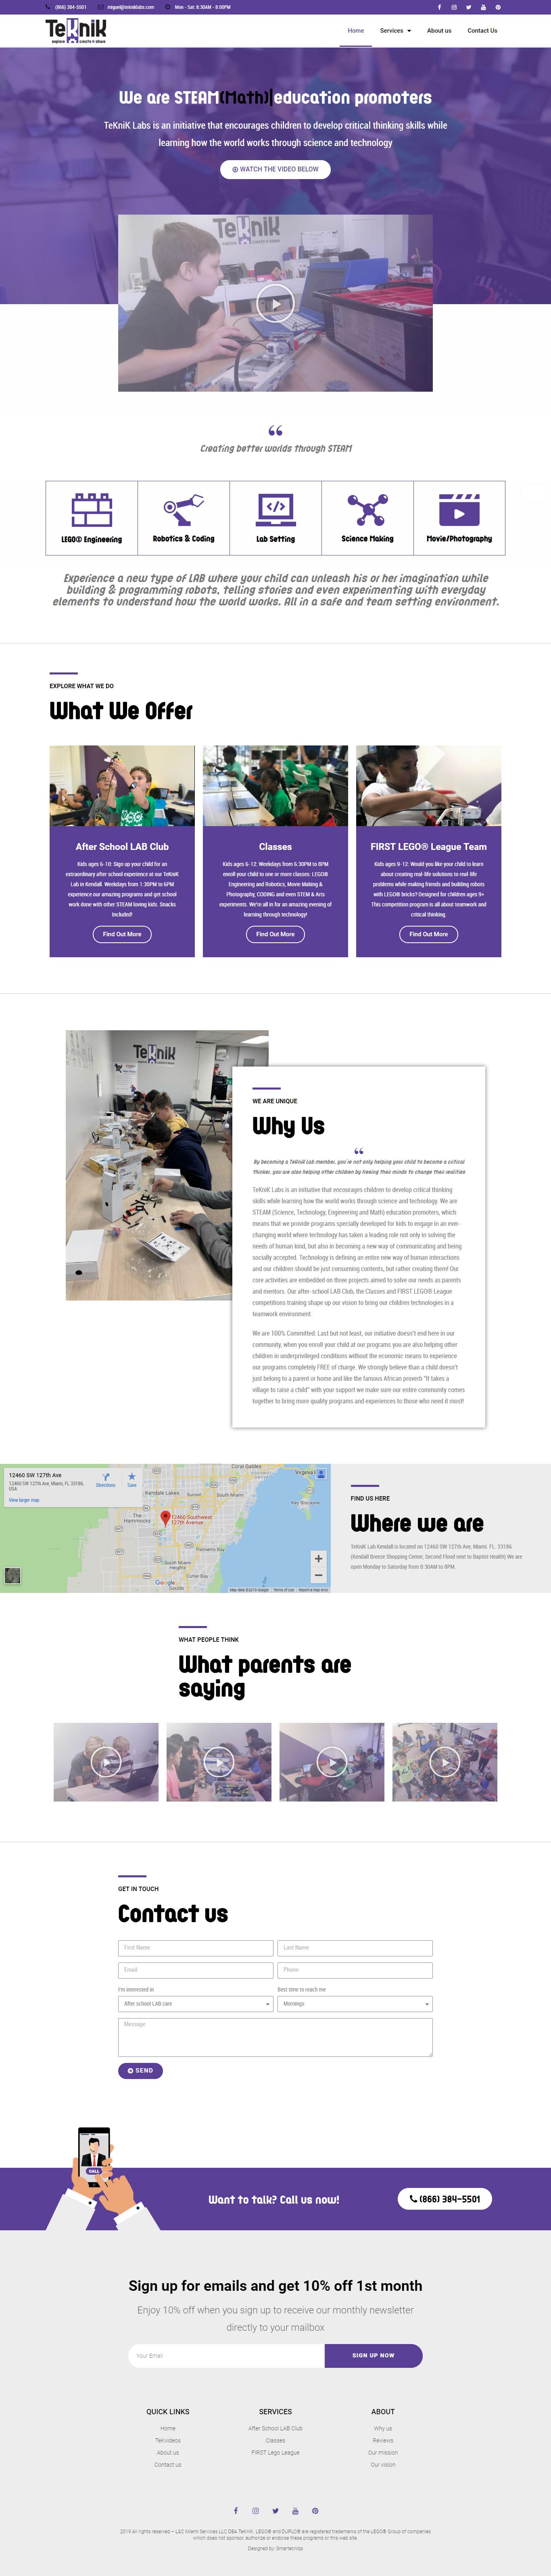 Teknik Labs Home Page Design